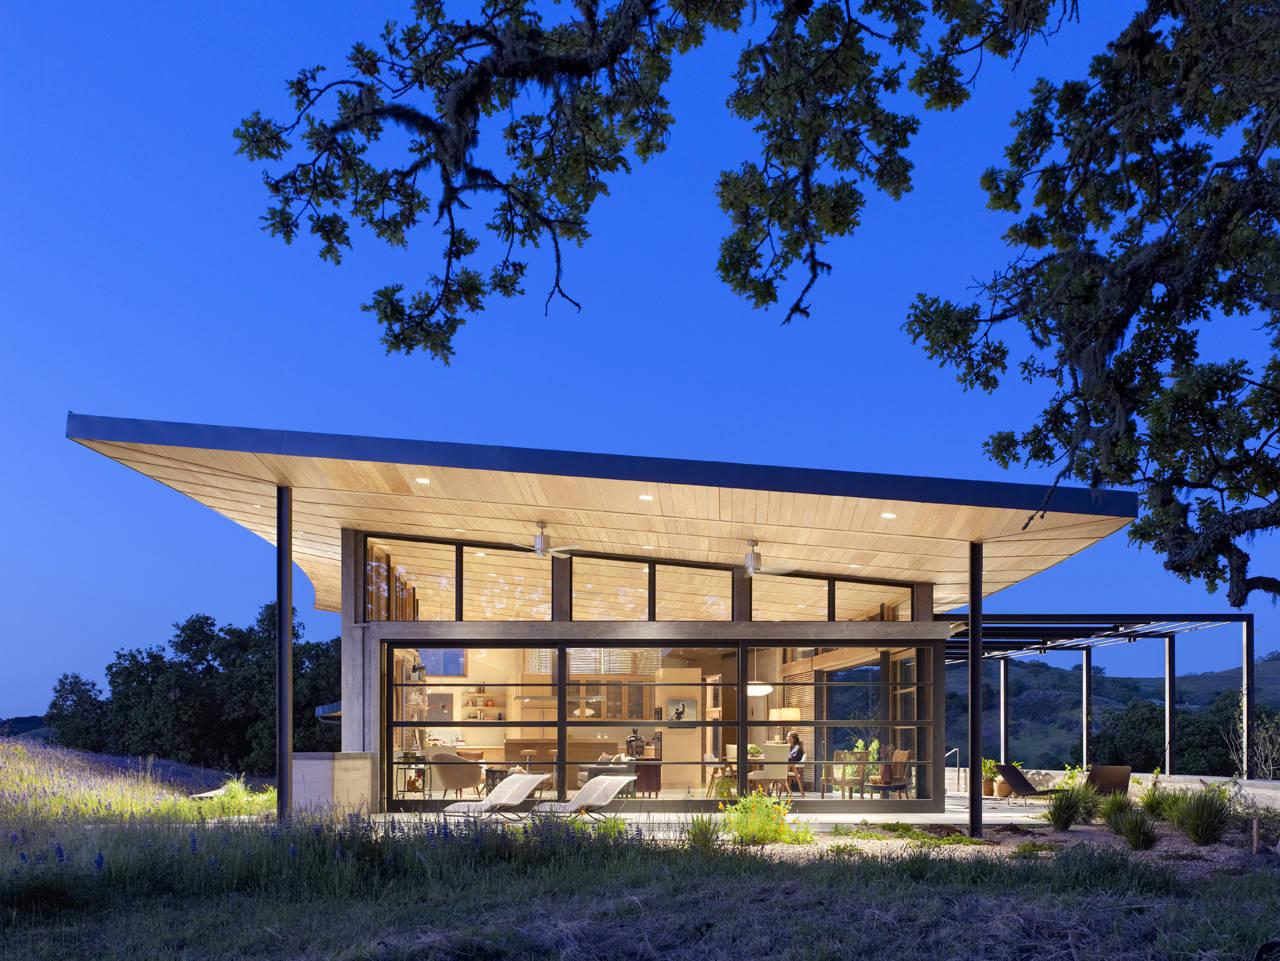 Evening Lighting, Caterpillar House in Carmel, California by Feldman Architecture